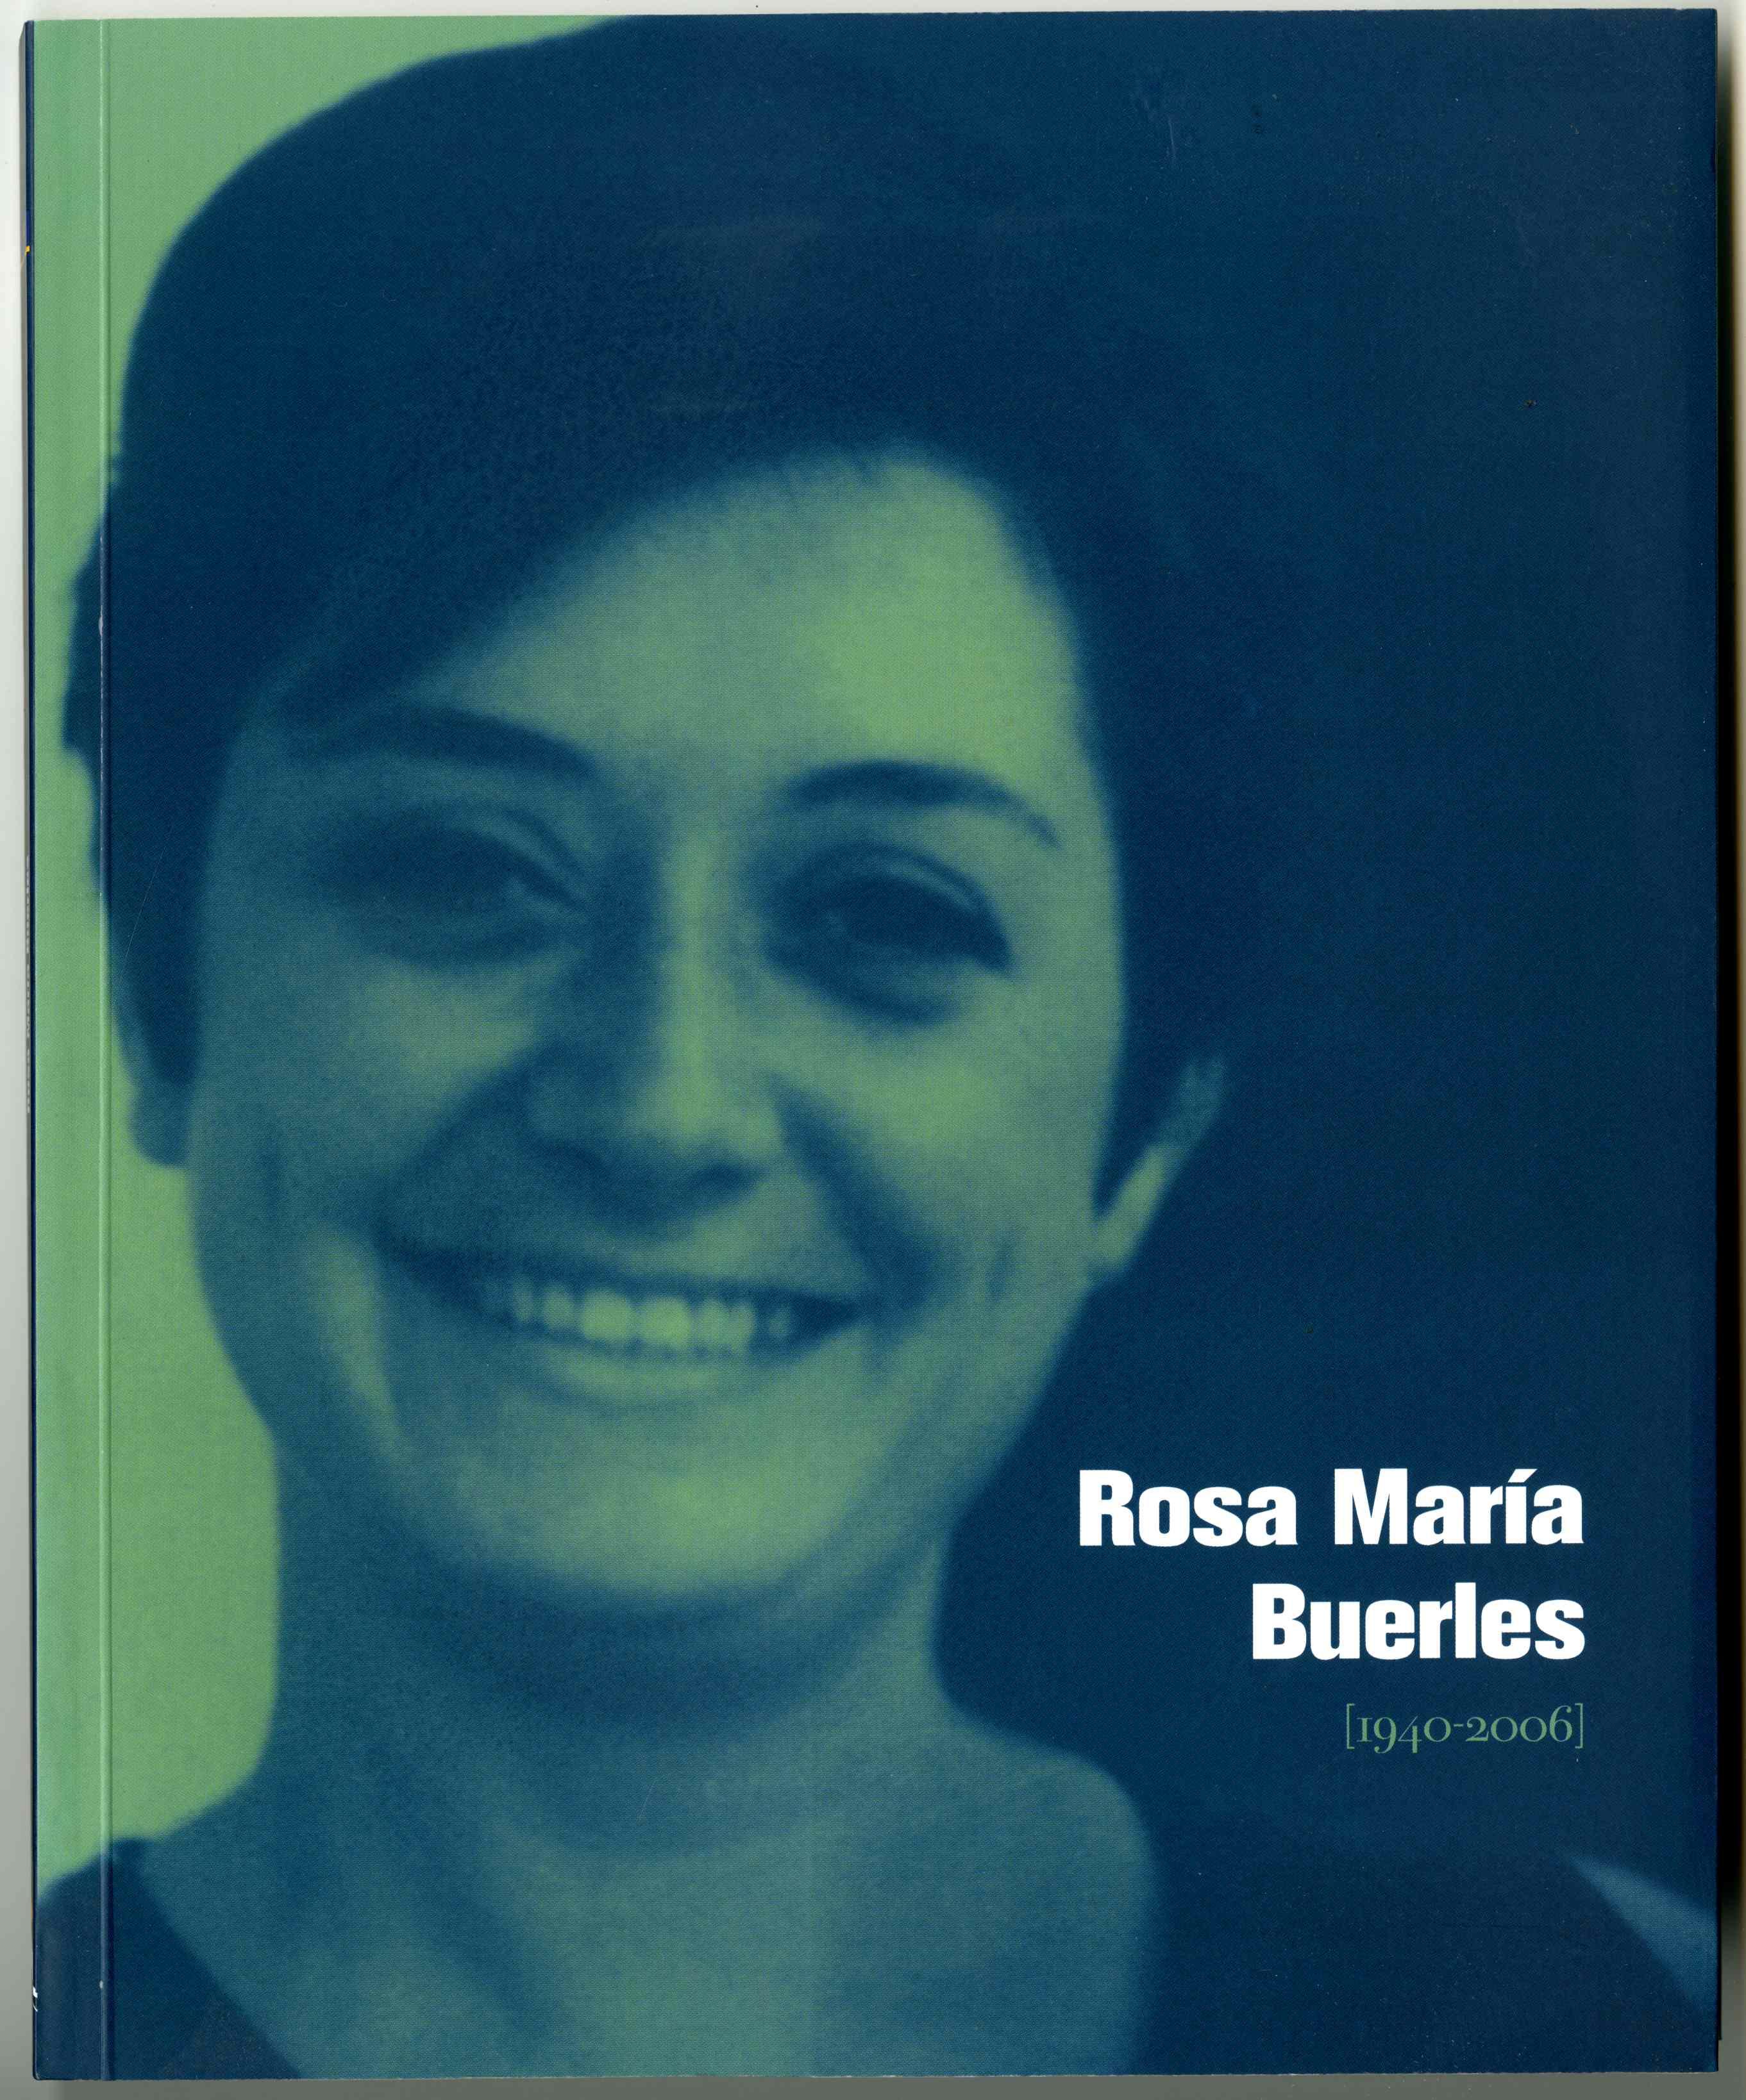 ROSA MARIA BUERLES